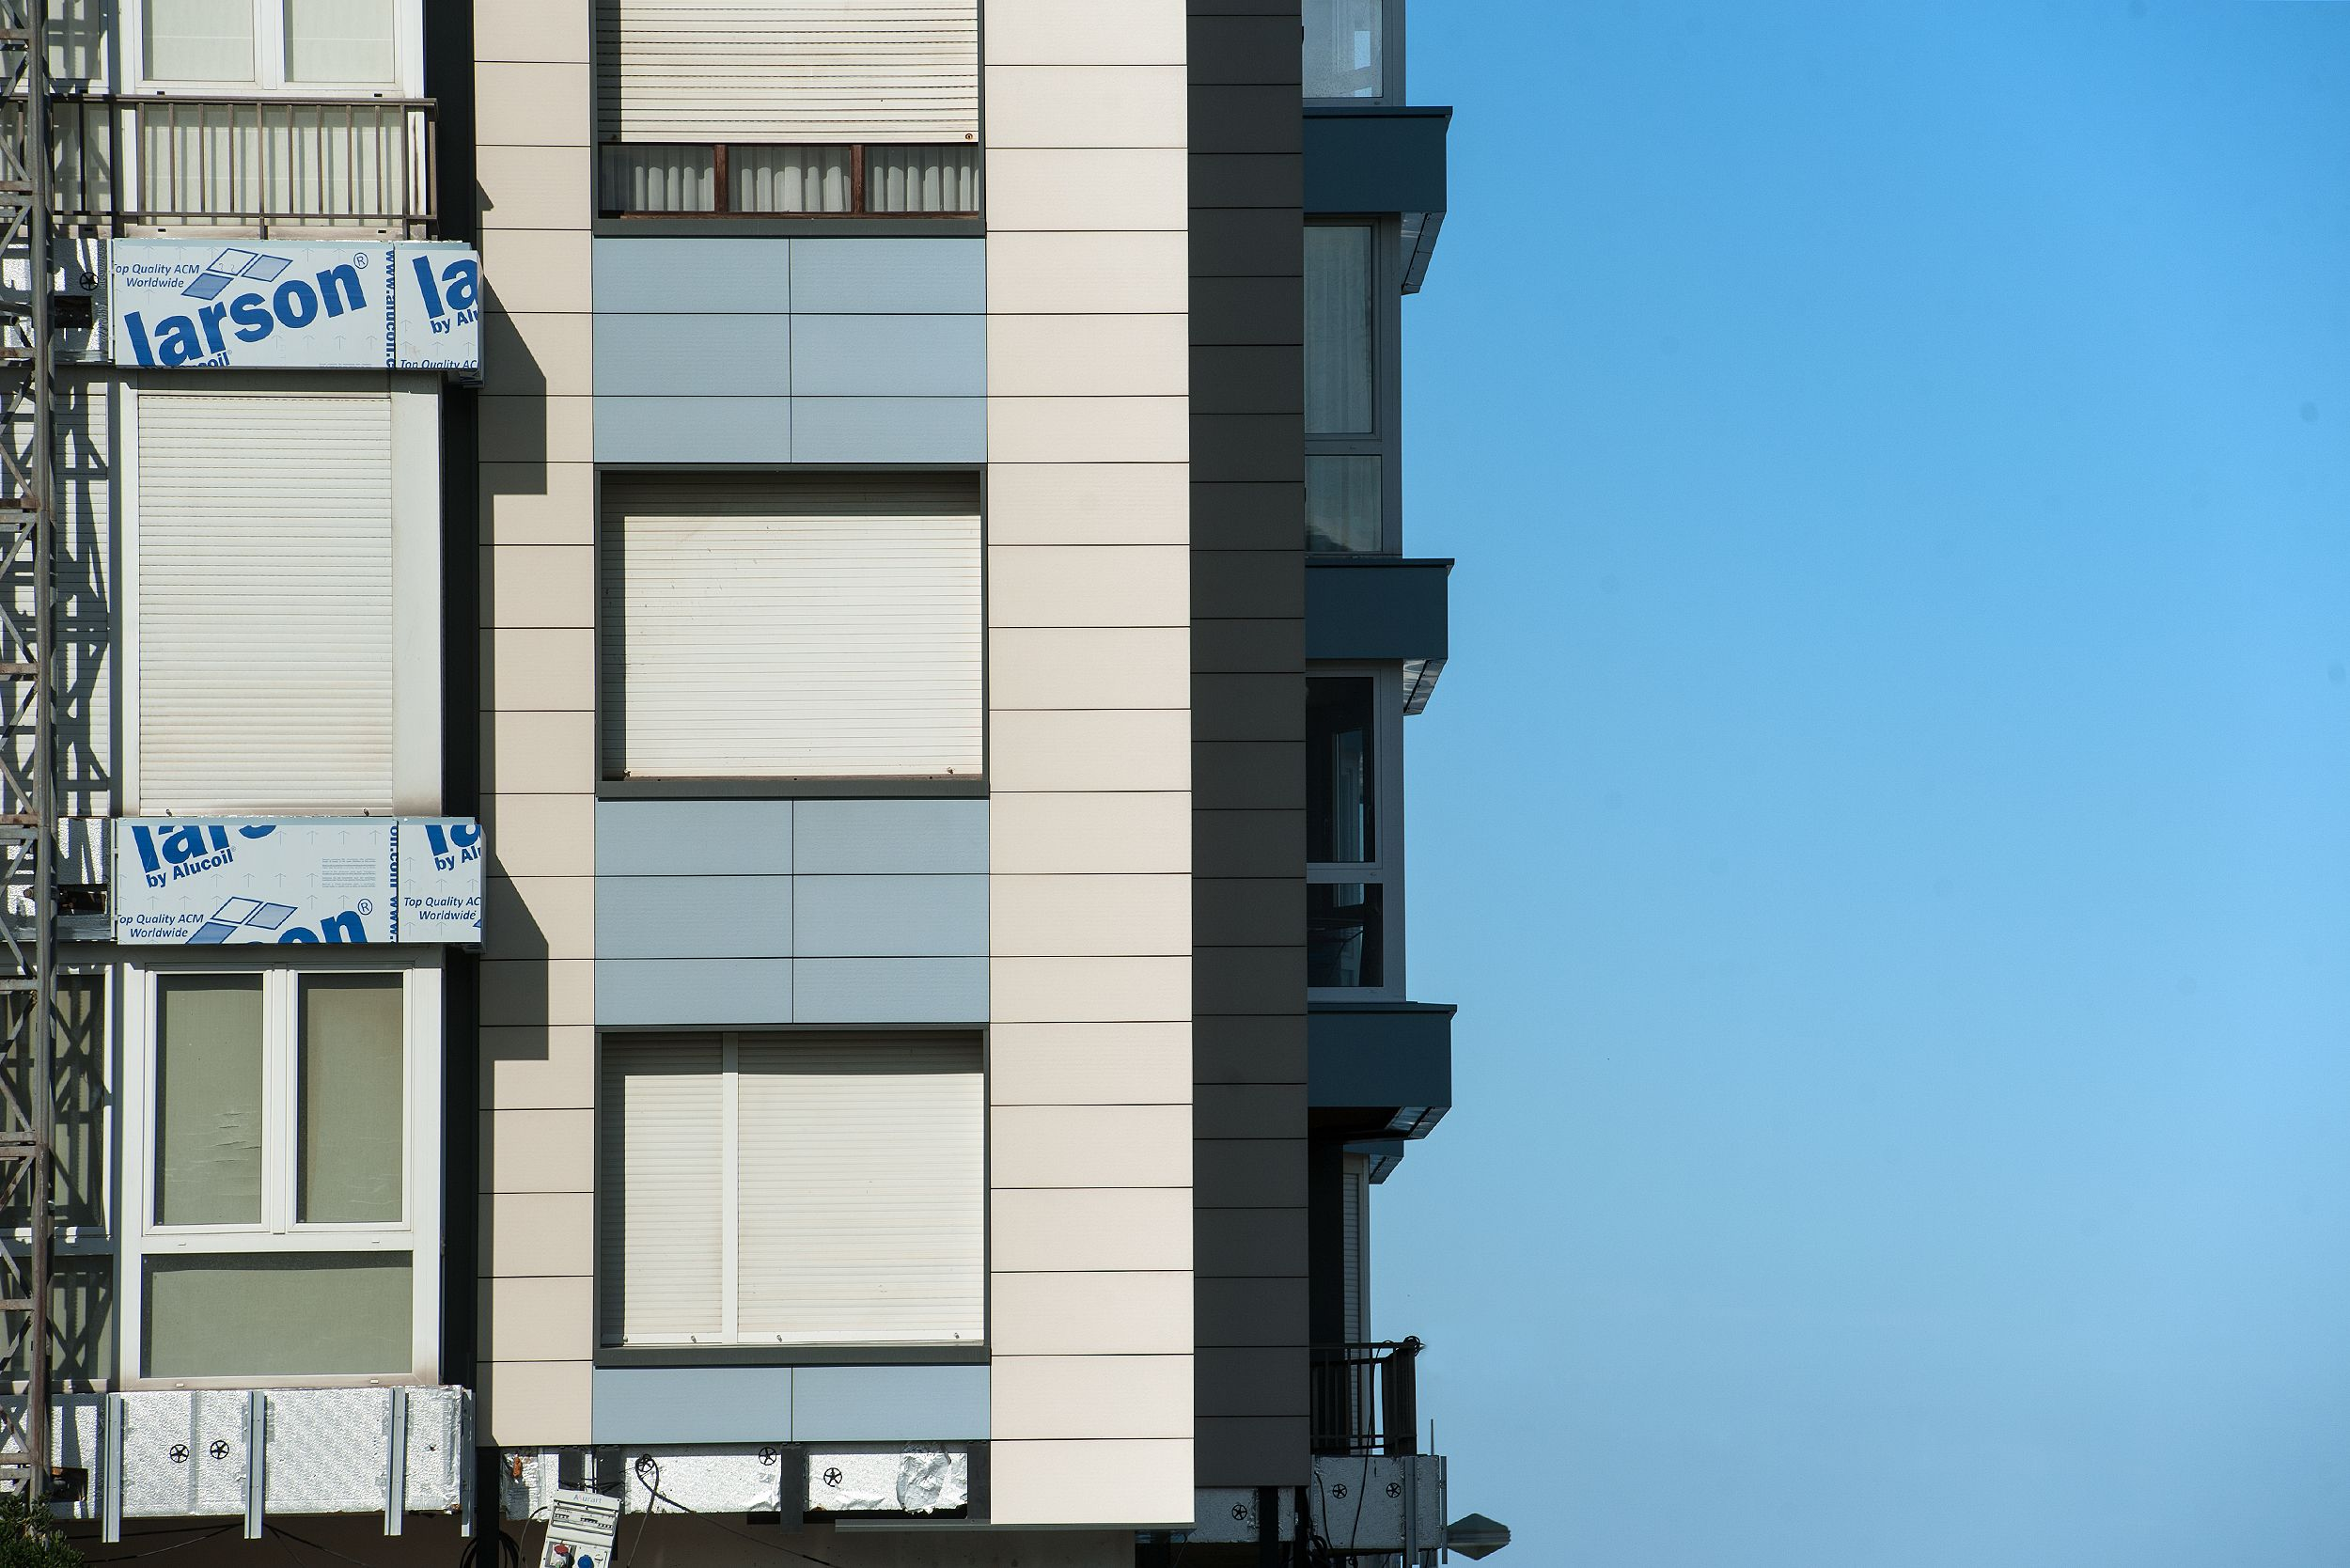 Expertos en fachadas en Mieres, Asturias